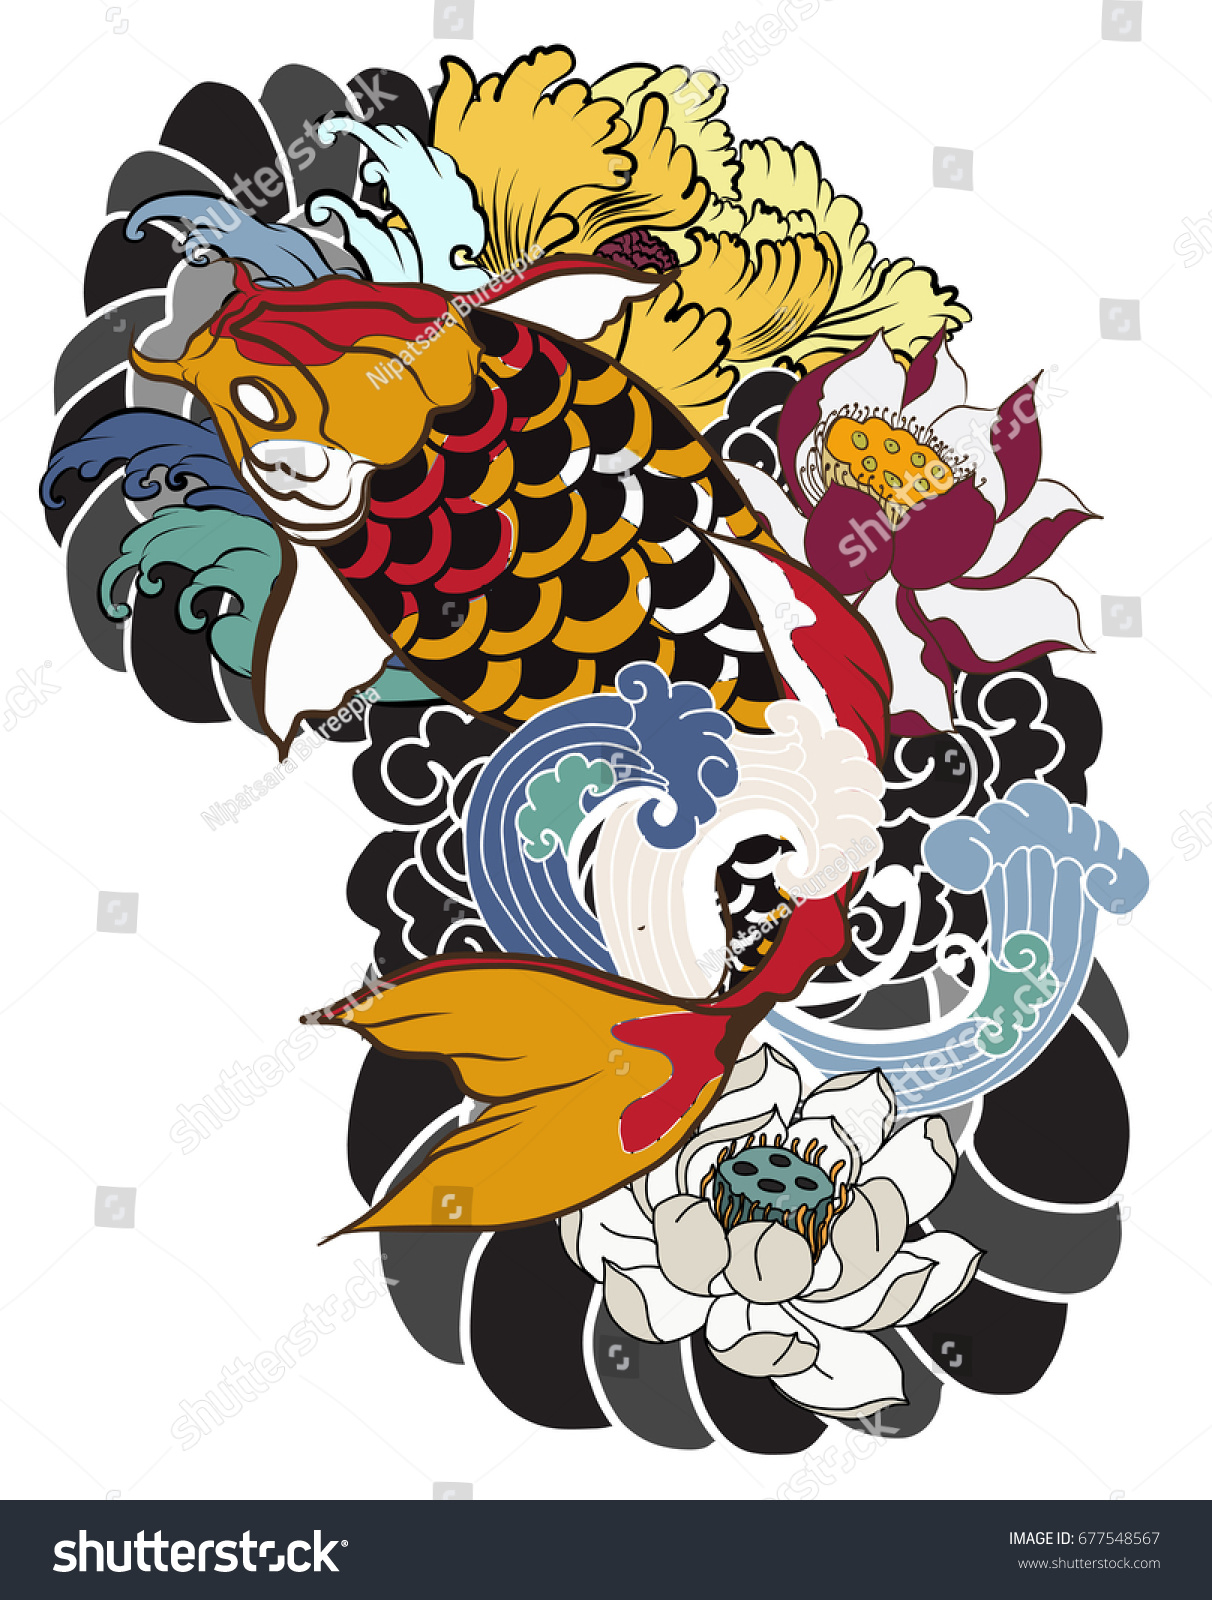 Hand drawn koi fish flower tattoo stock vector royalty free hand drawn koi fish with flower tattoo for armlorful koi carp with water splash izmirmasajfo